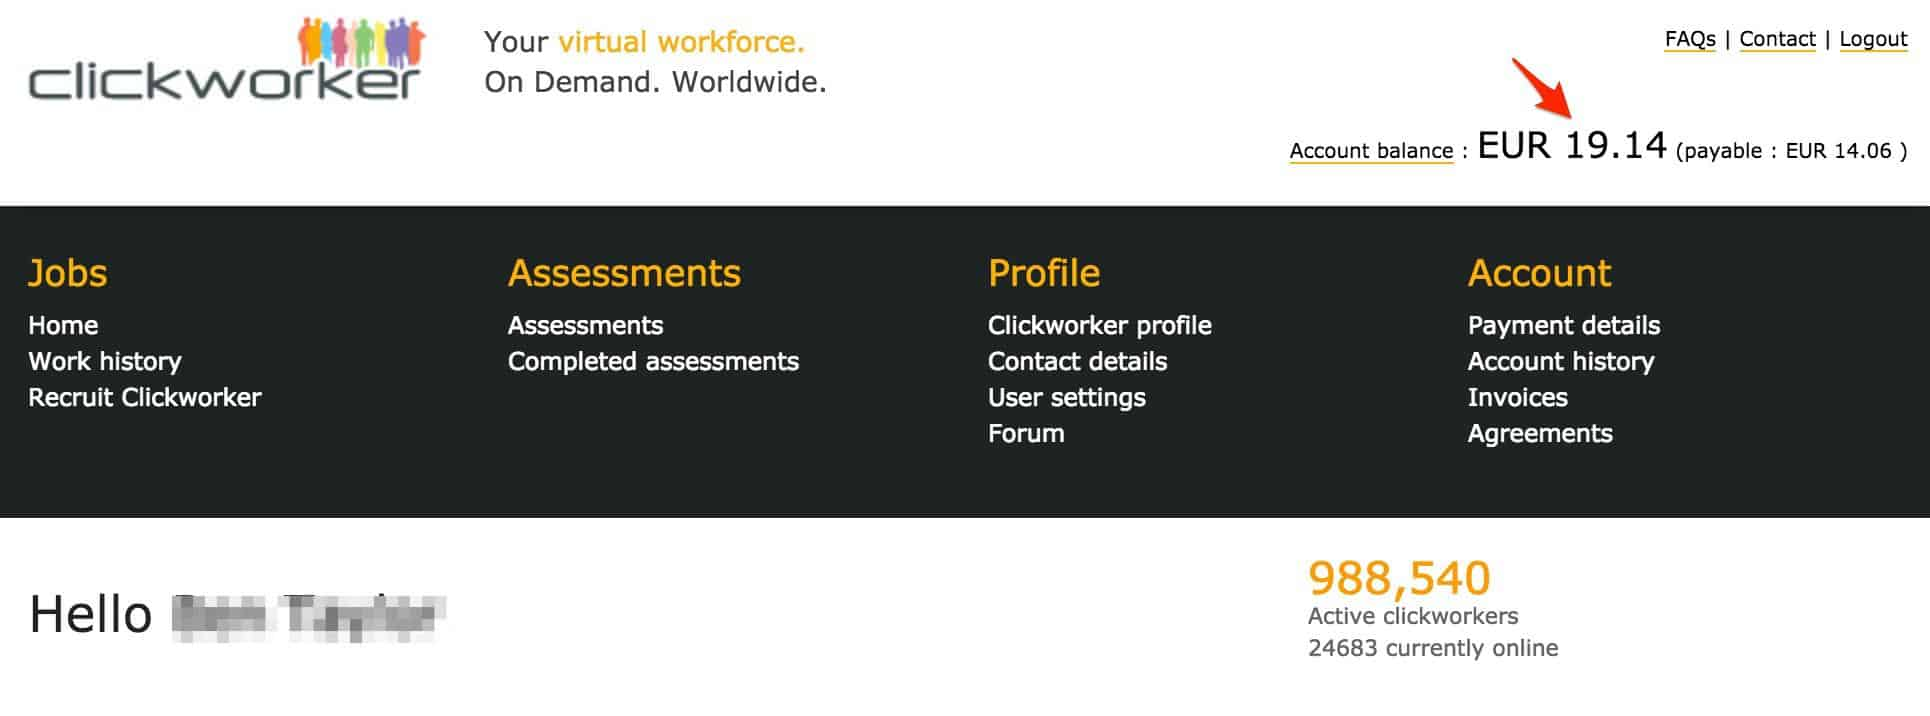 ClickWorker stats